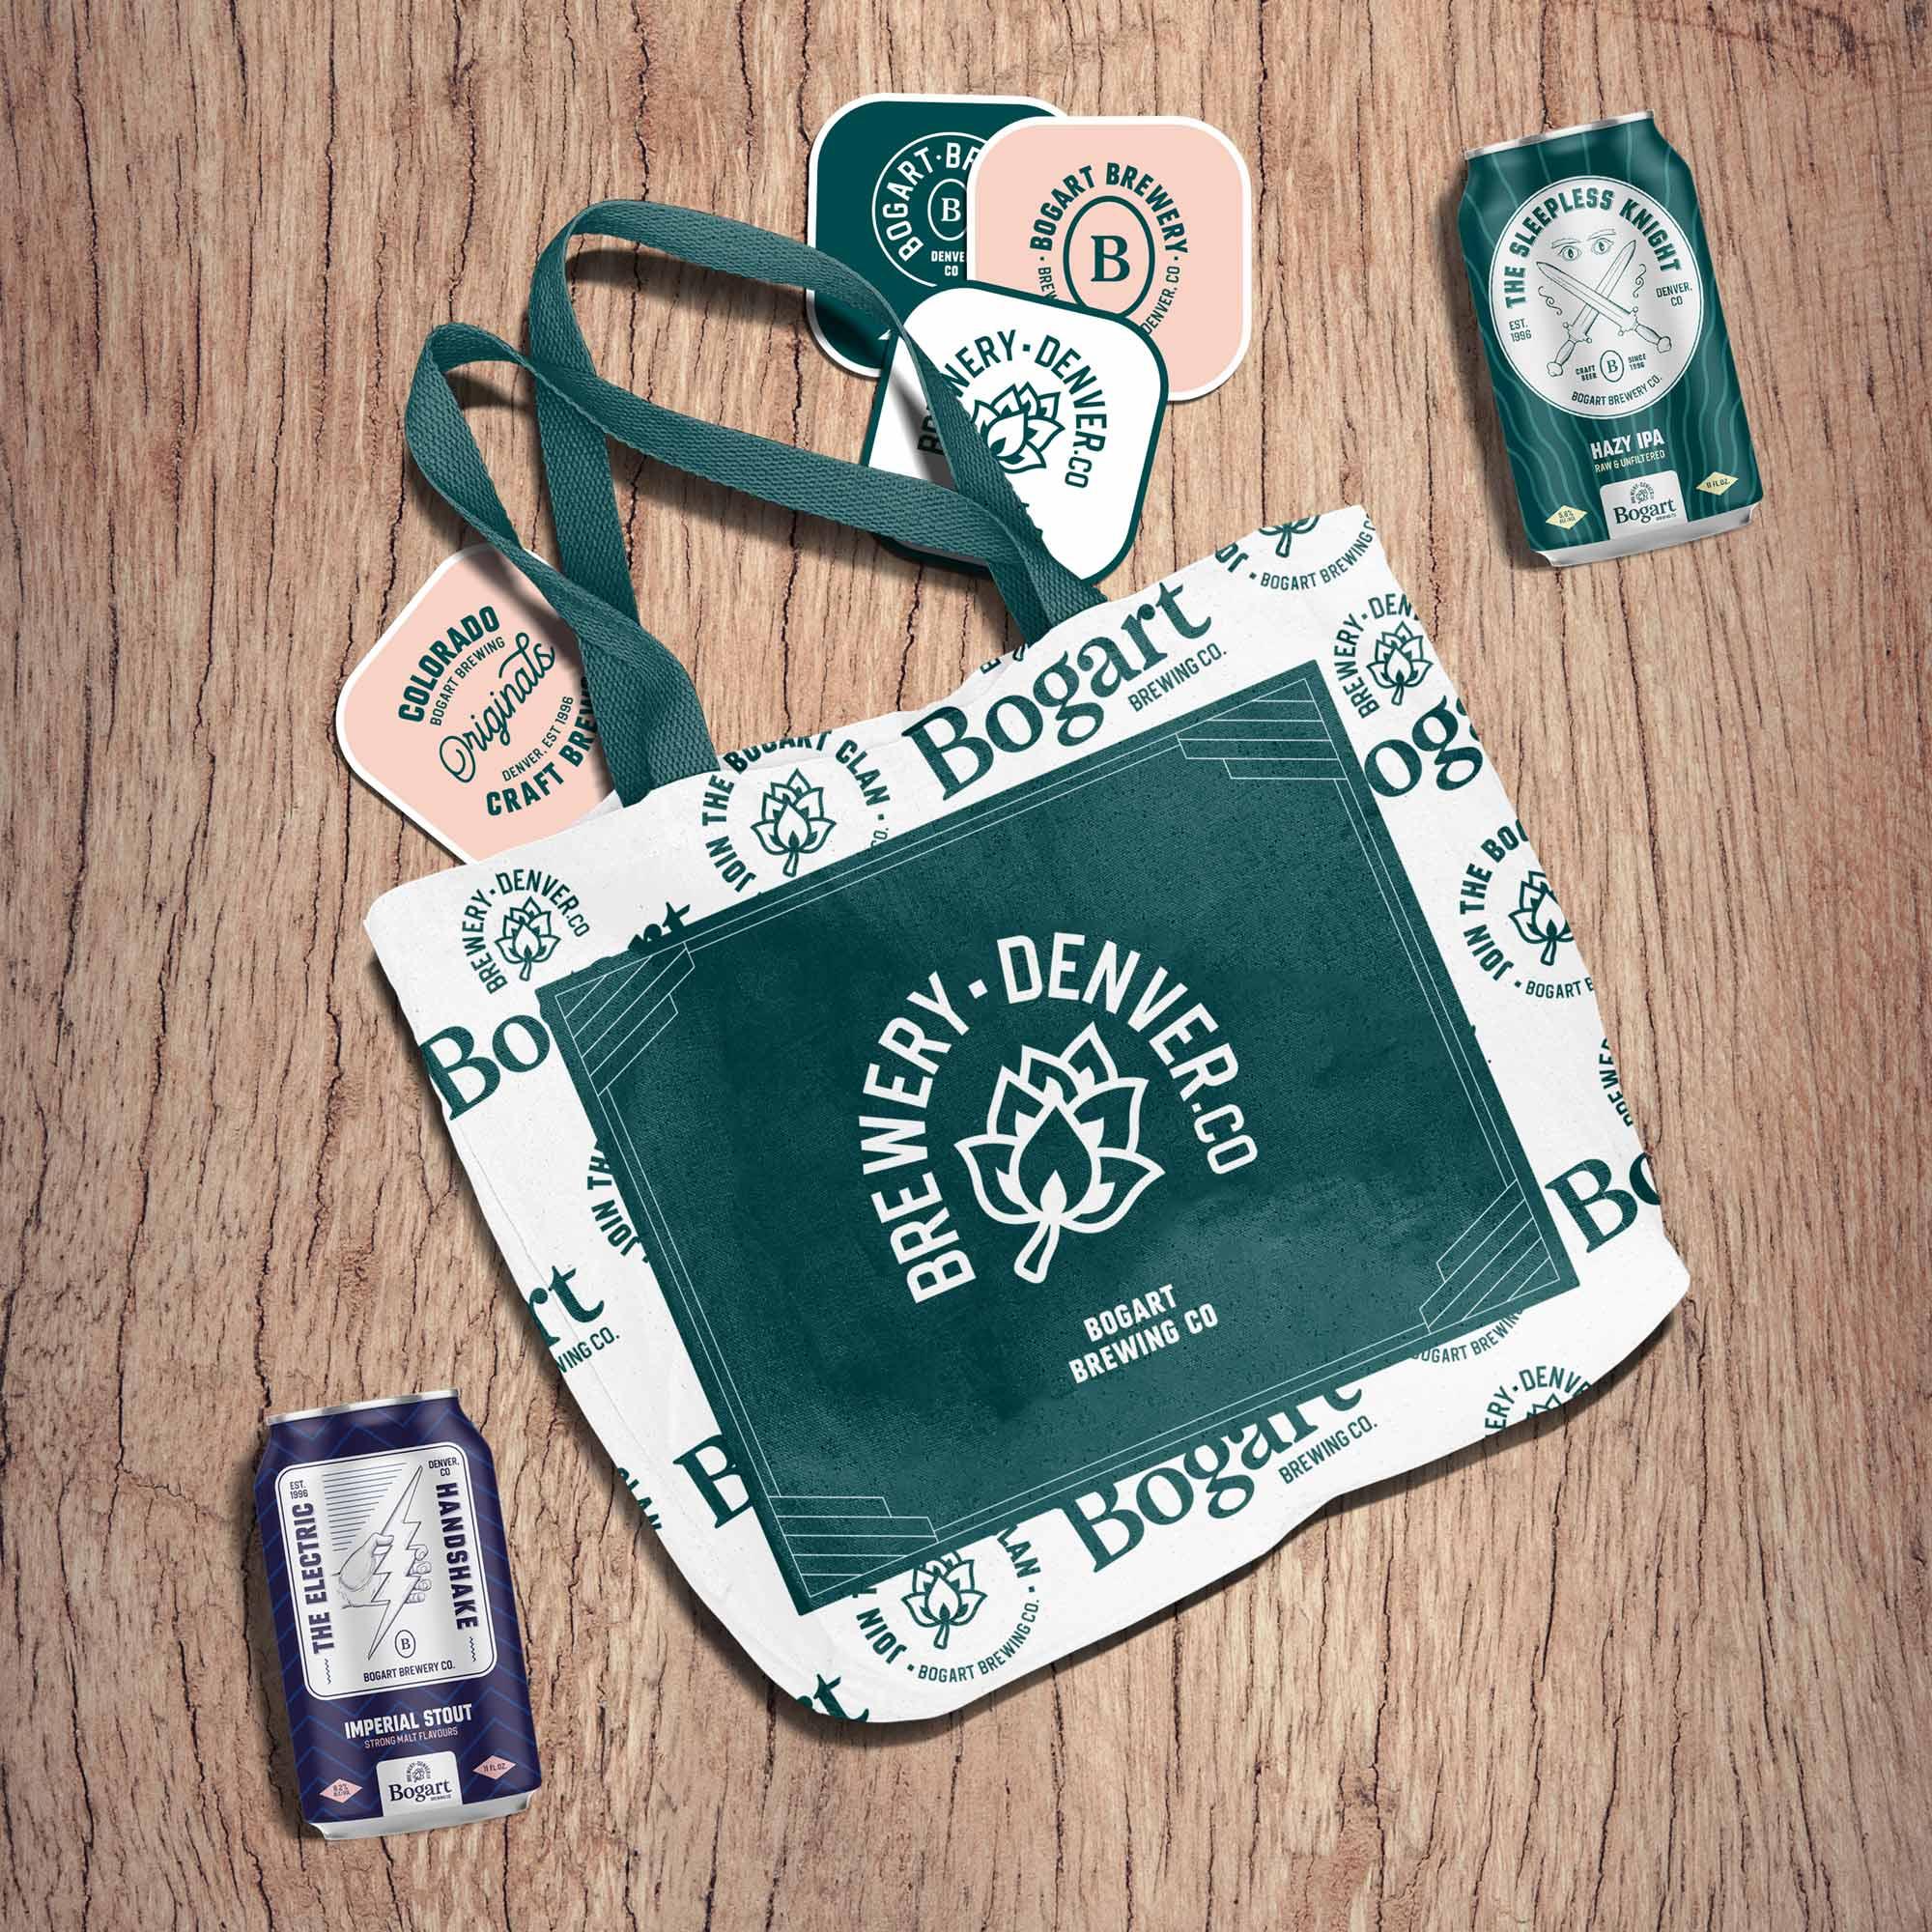 Bogart brewery craft brewery branding tote bag and beer cans mockup Kalistostudio craft beer design